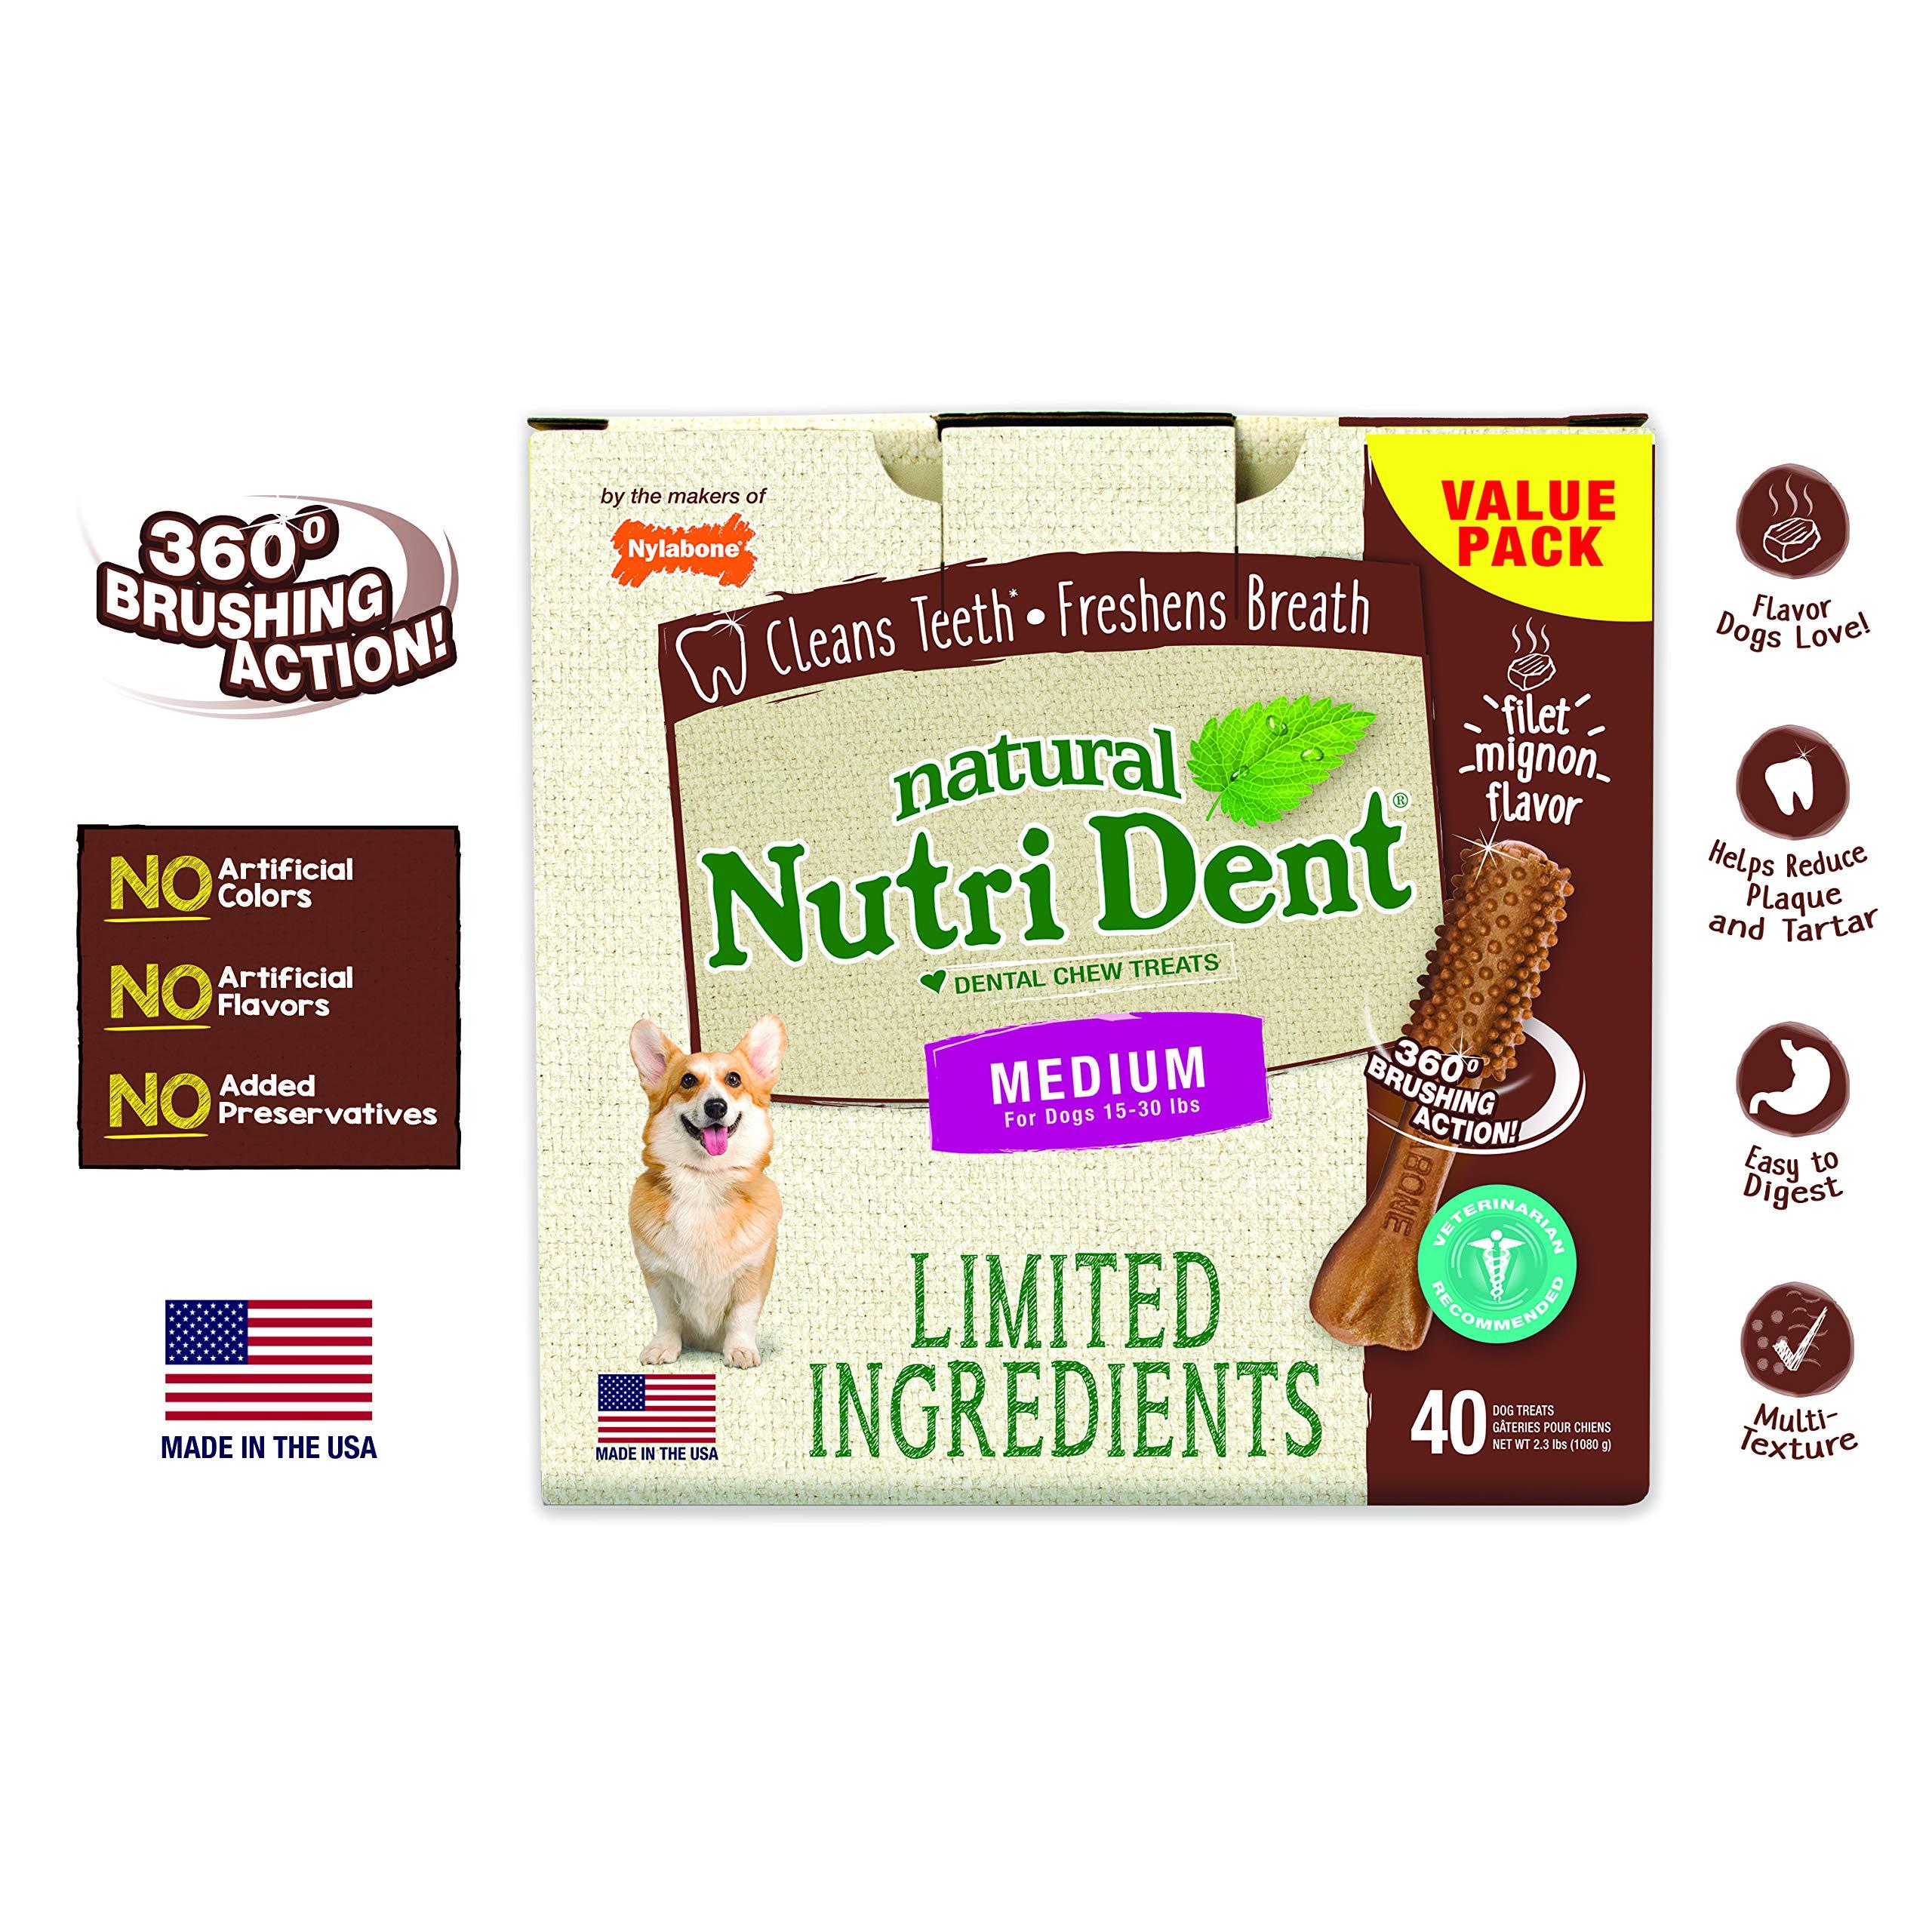 Nylabone NutriDent Natural Dental Chew Treats Filet Mignon, Medium, 40 Count